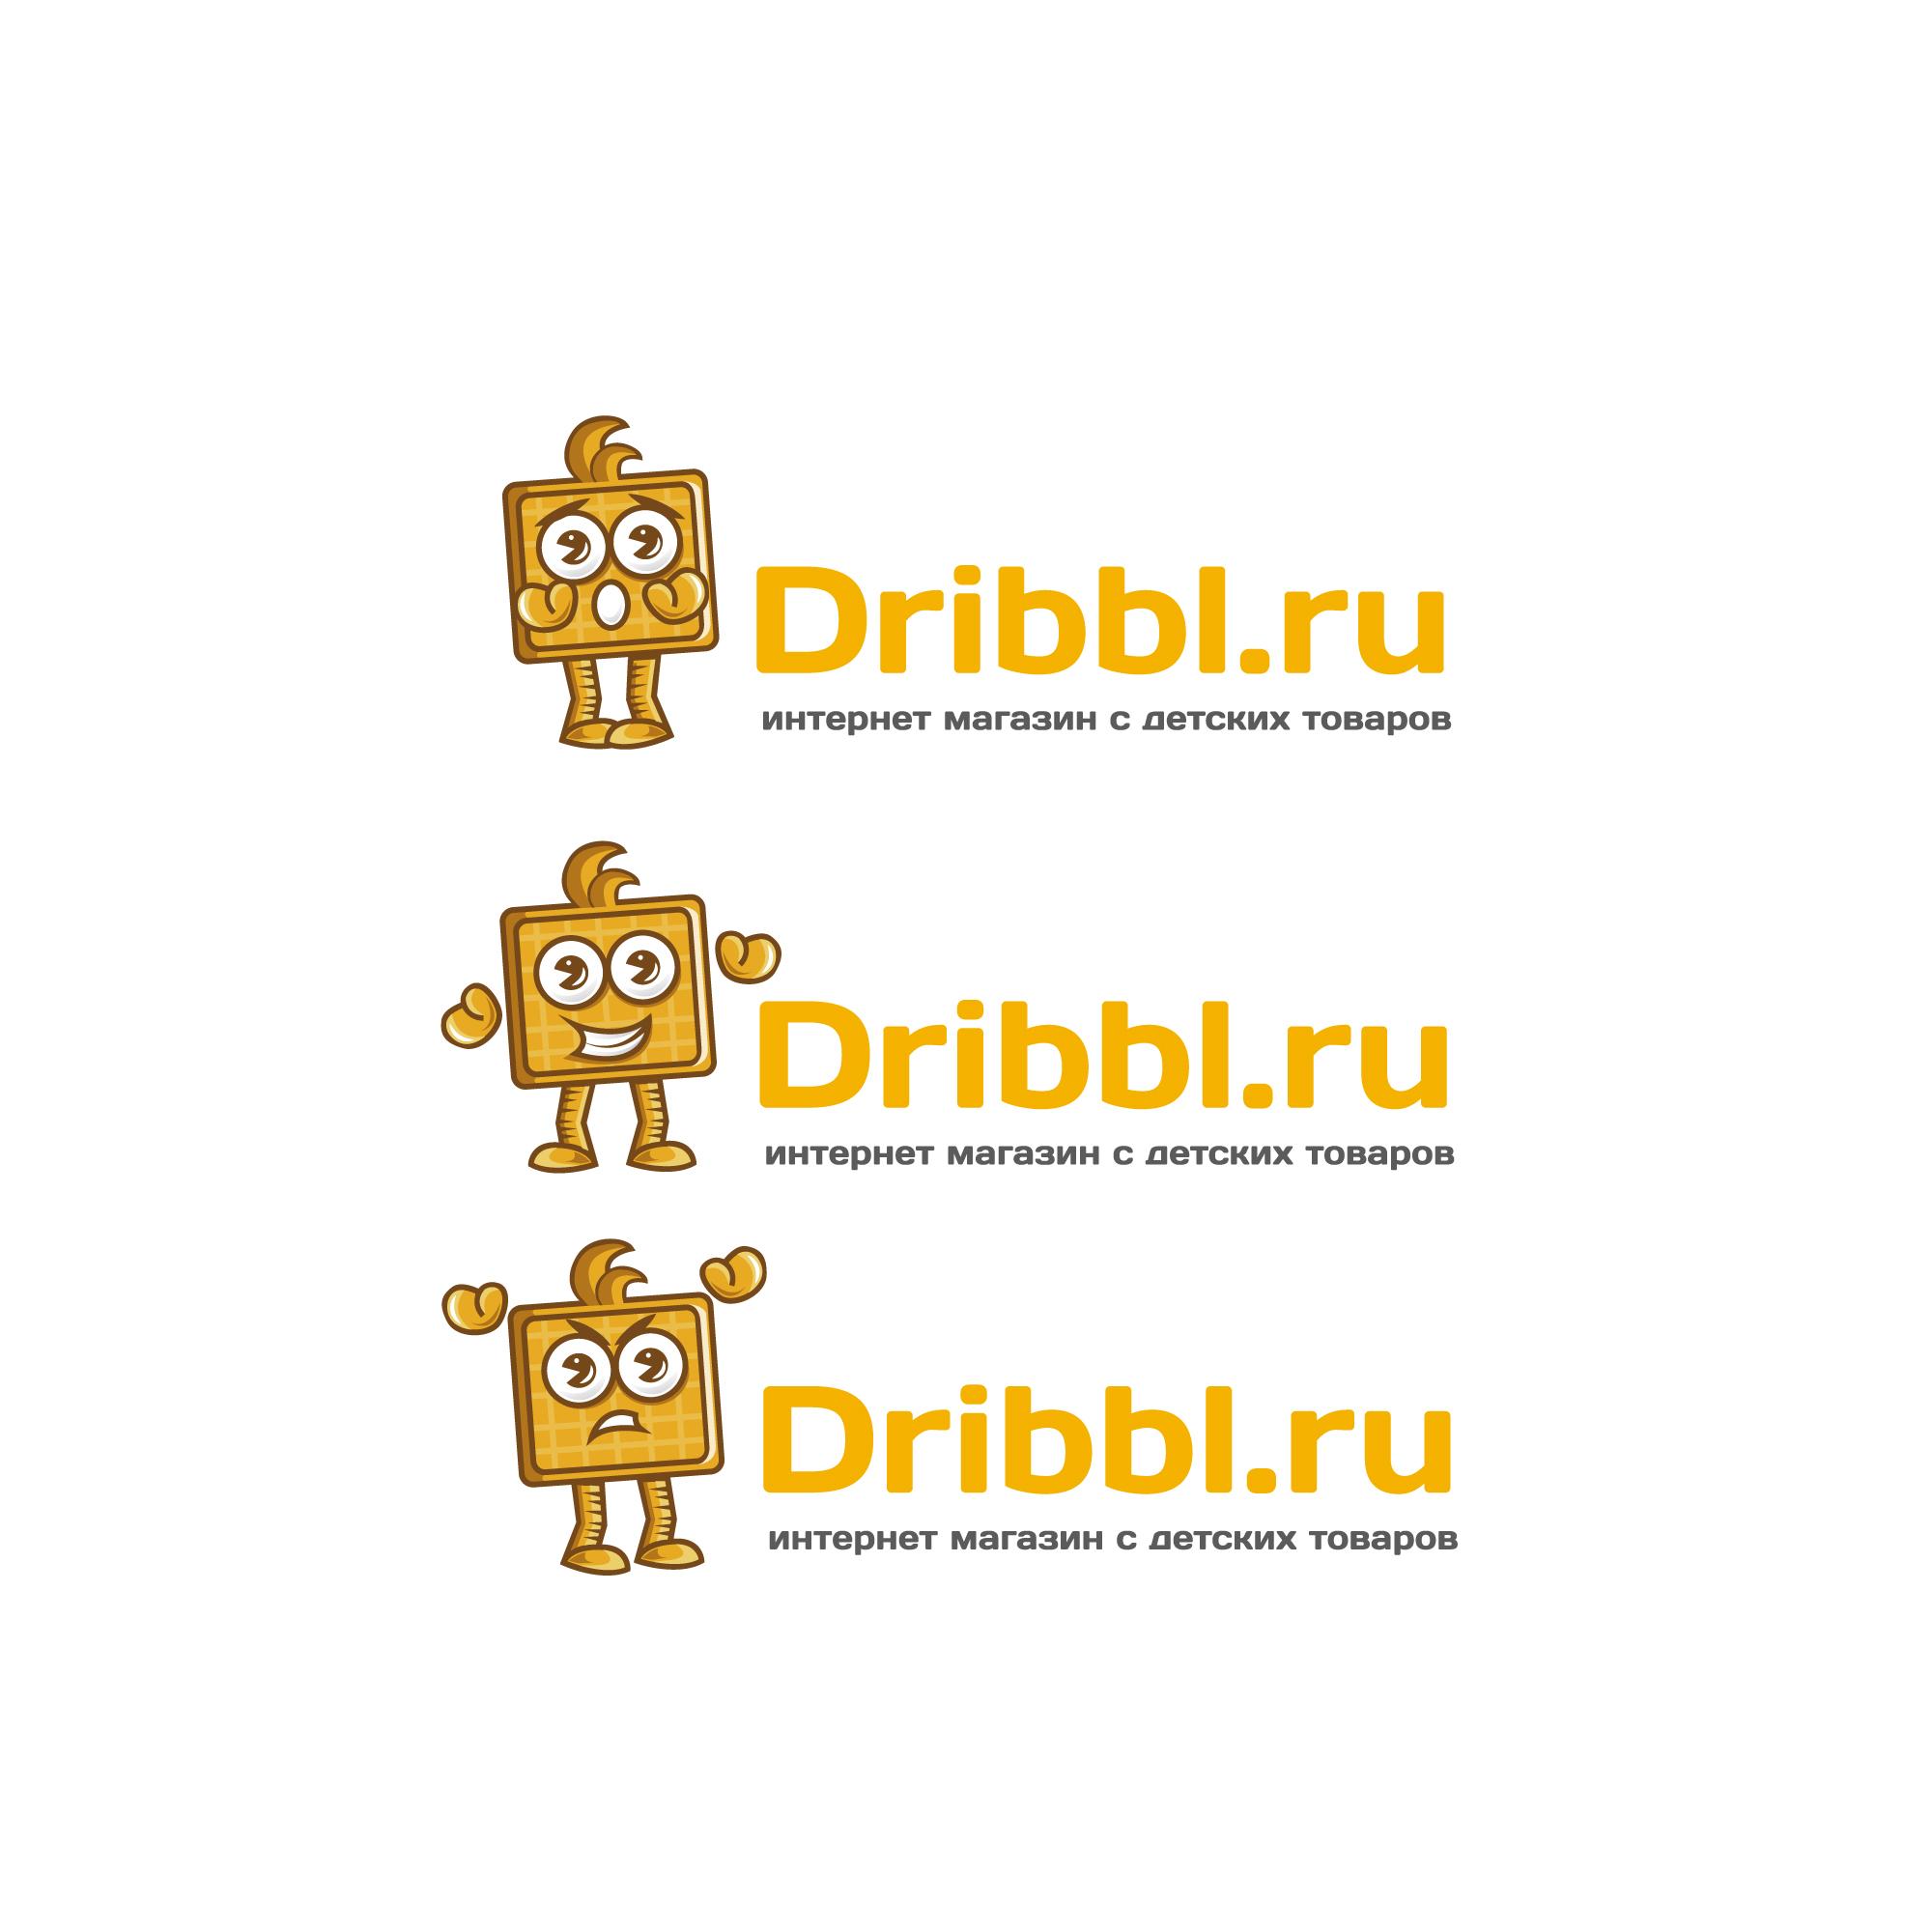 Разработка логотипа для сайта Dribbl.ru фото f_5295a9d4993d0c0c.jpg